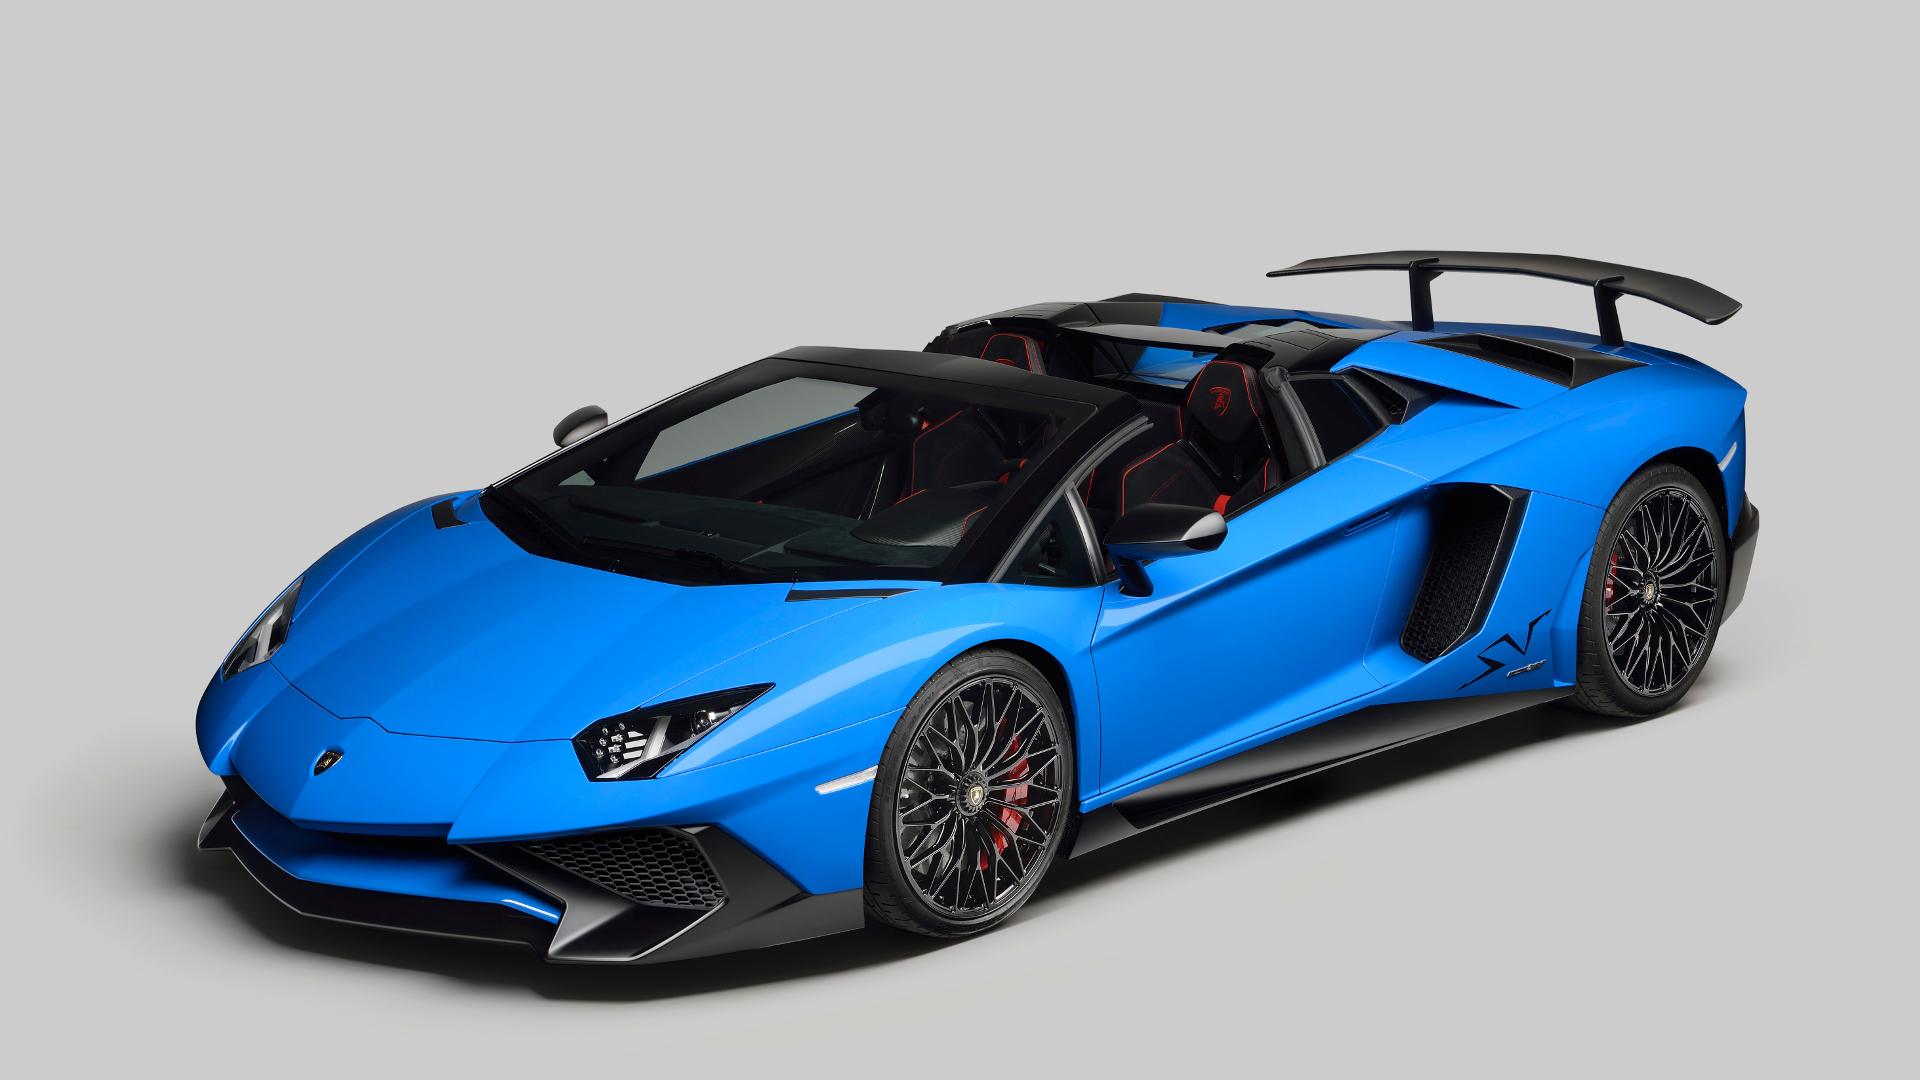 Lamborghini Aventador LP750-4 Superveloce Roadster_foto estudio